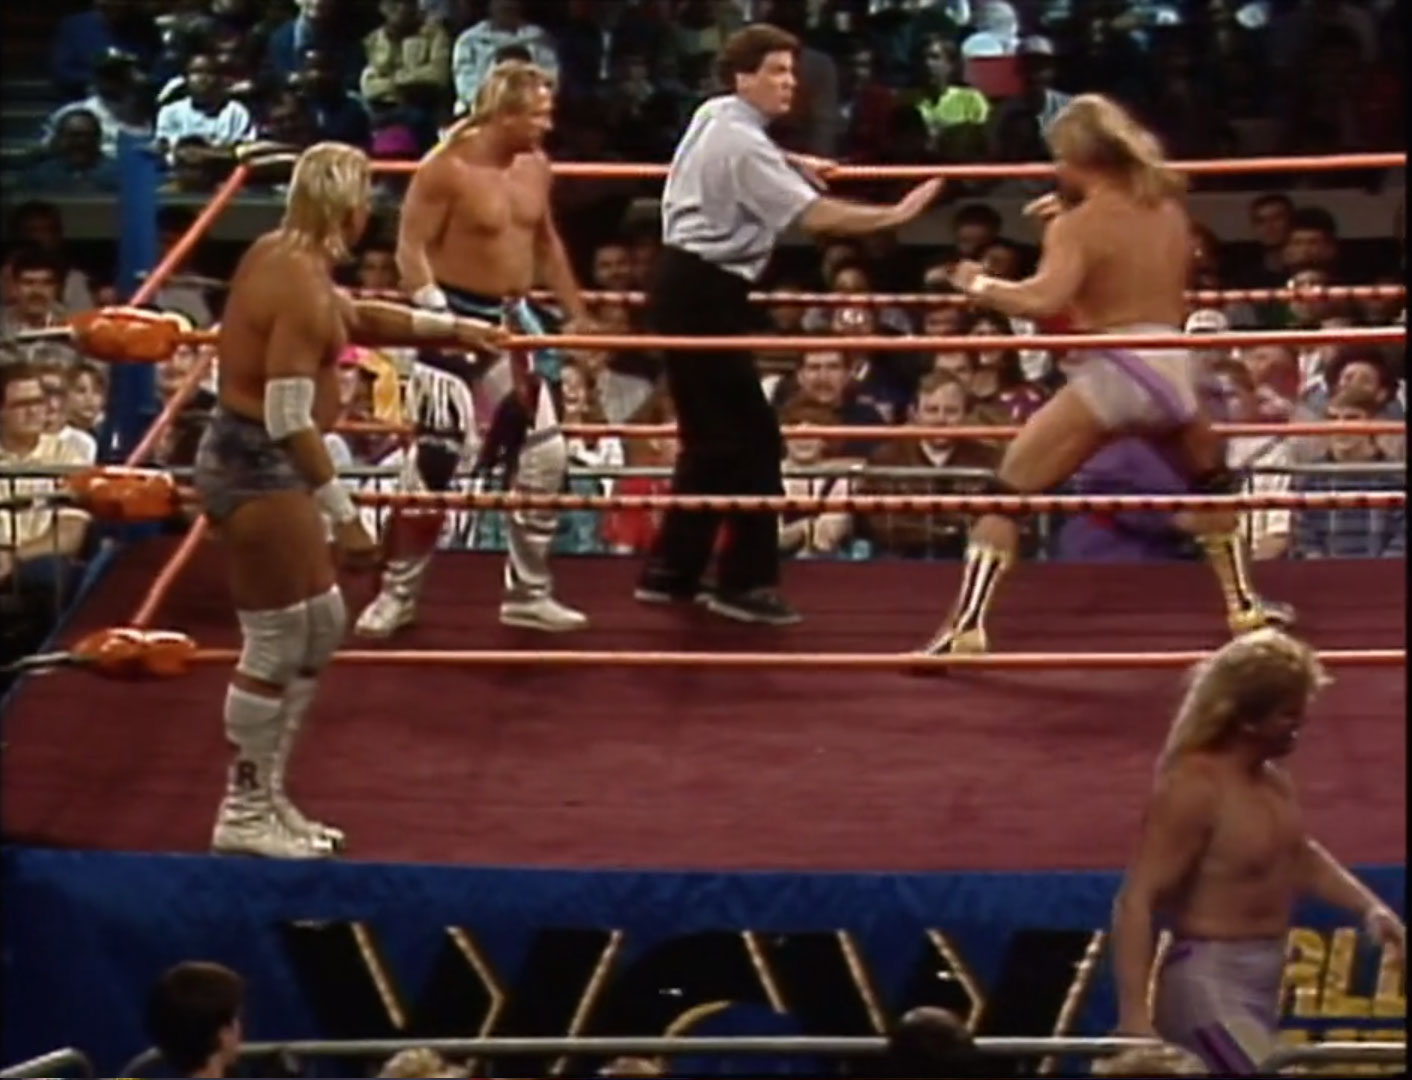 Tommy Rich & Ricky Morton vs. The Midnight Express NWA Halloween Havoc '90 Oct 27th 1990